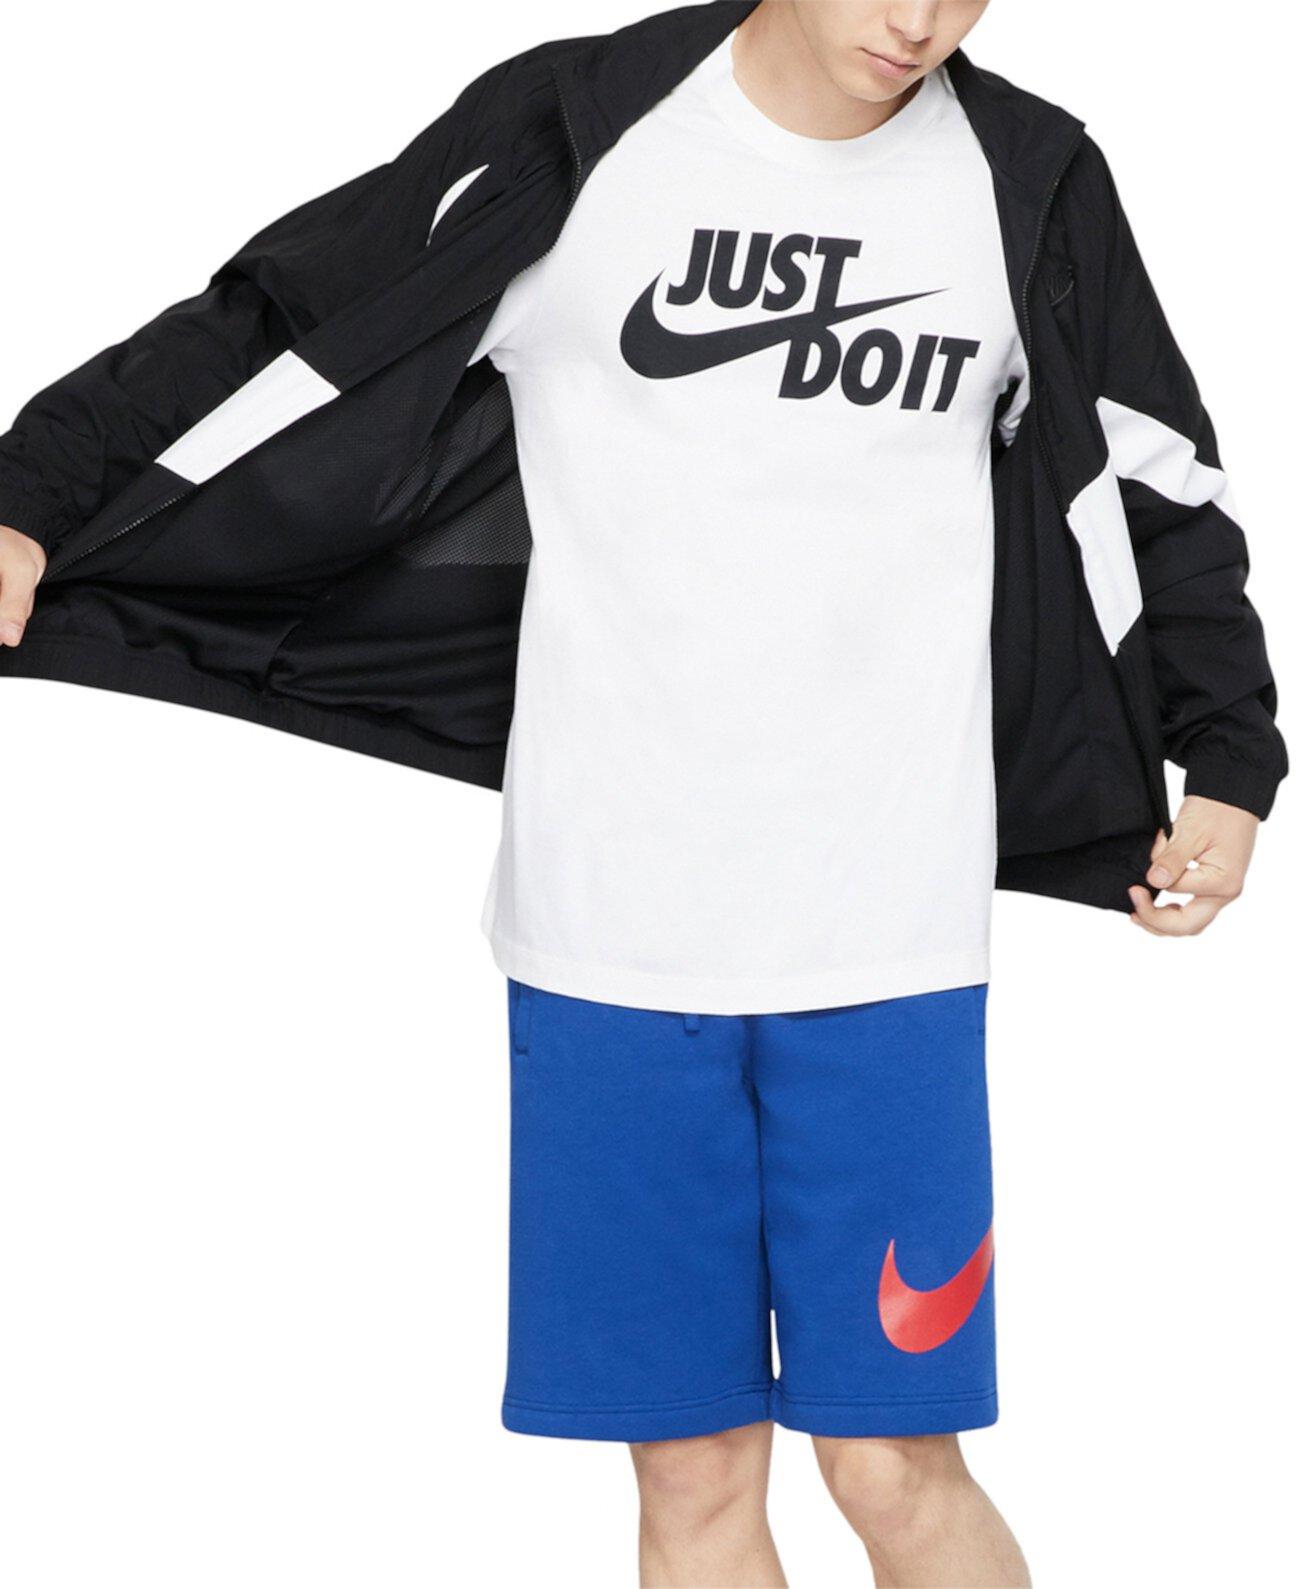 Мужская спортивная одежда Just Do It Футболка Nike